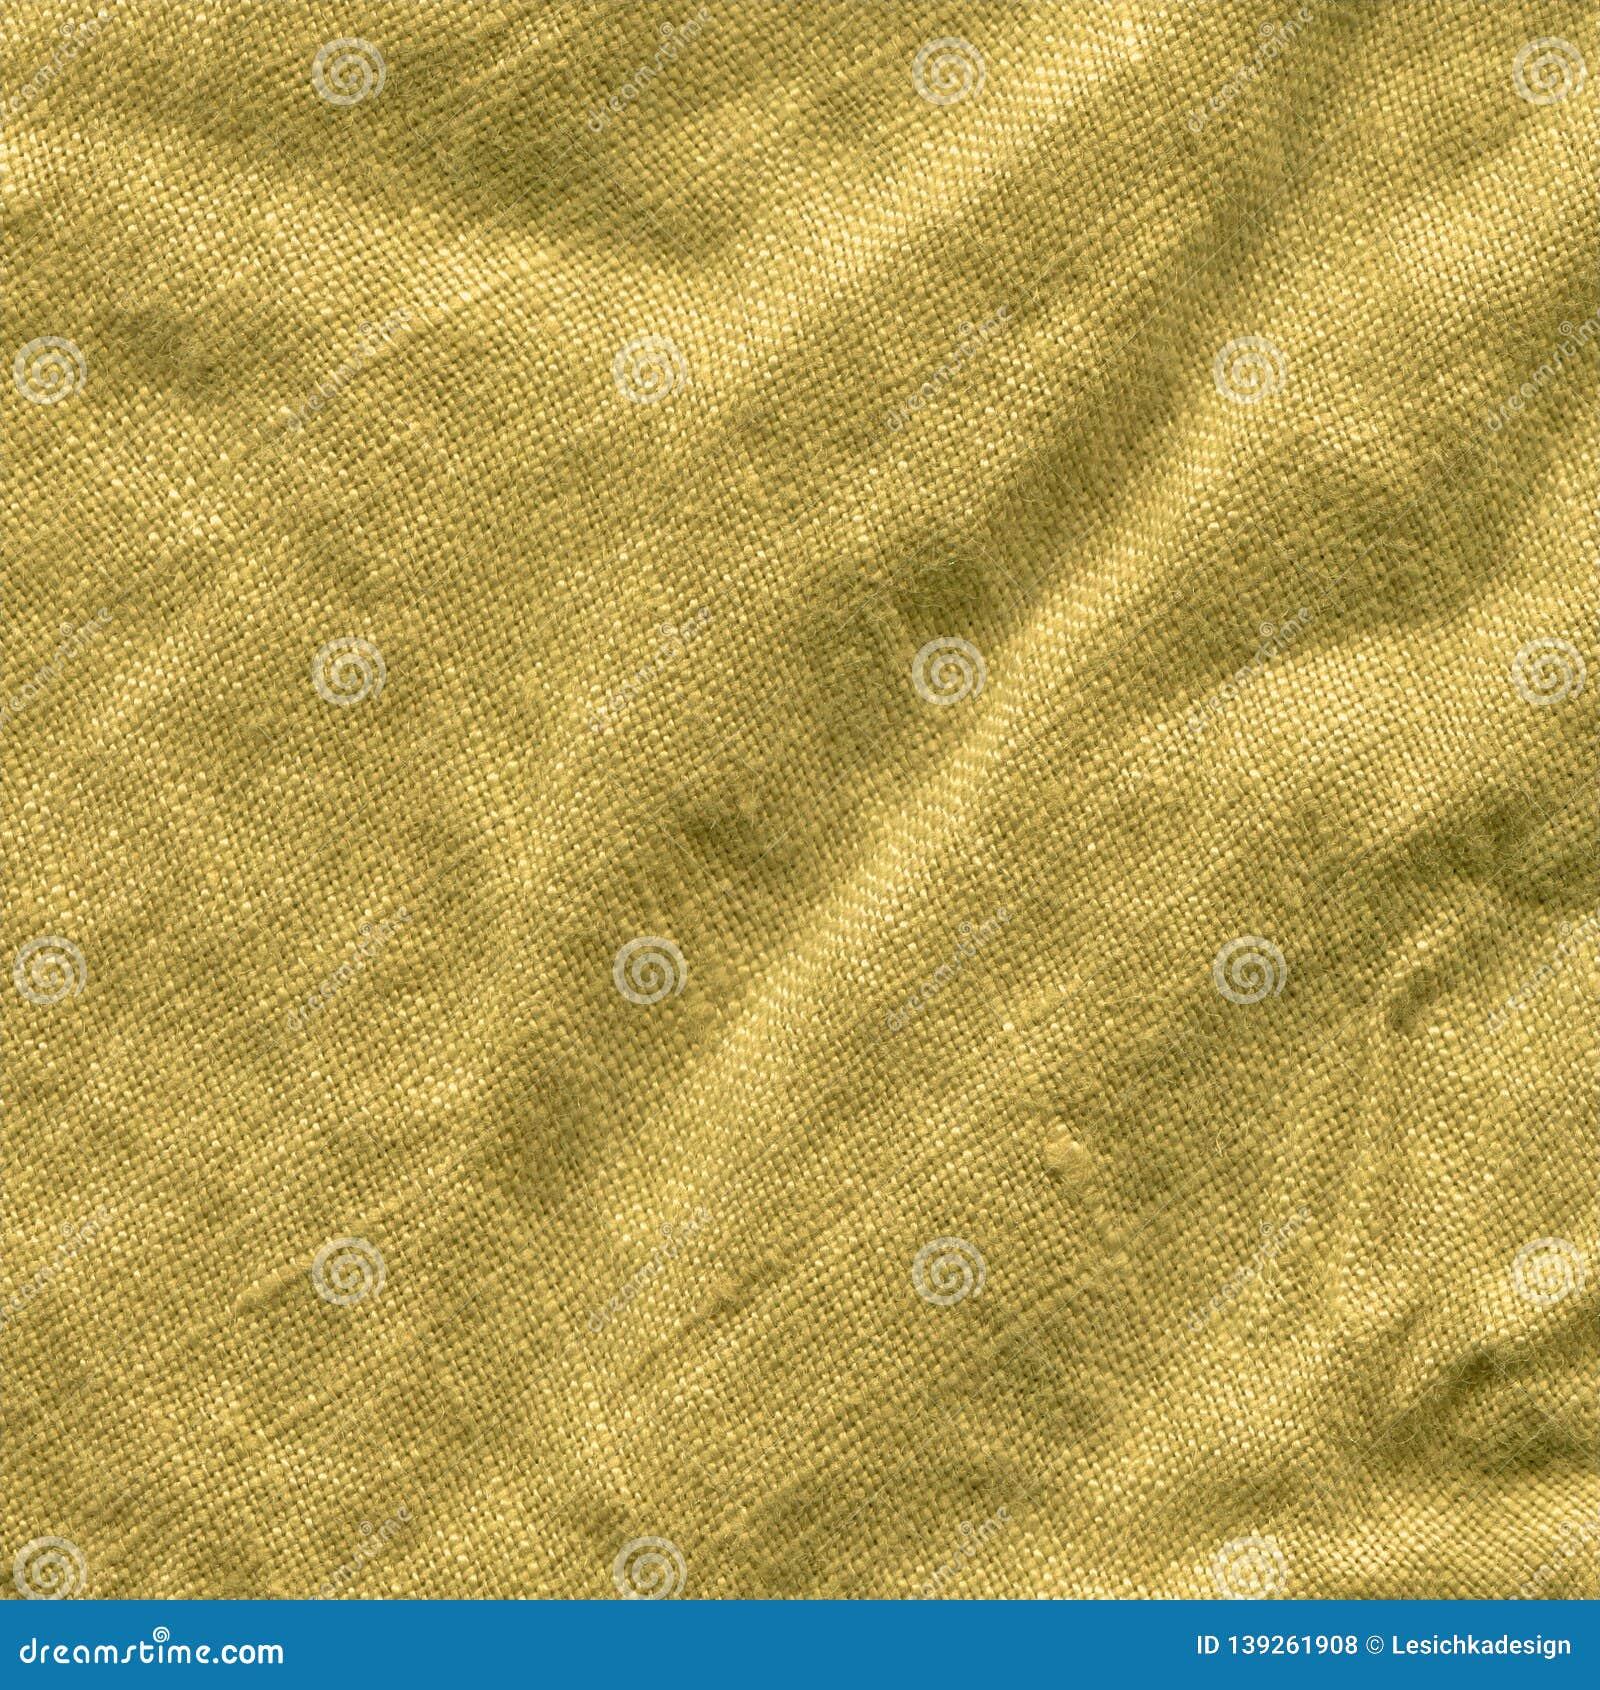 Mustard Color Fabric Closeup Stock Photo - Image of fabric